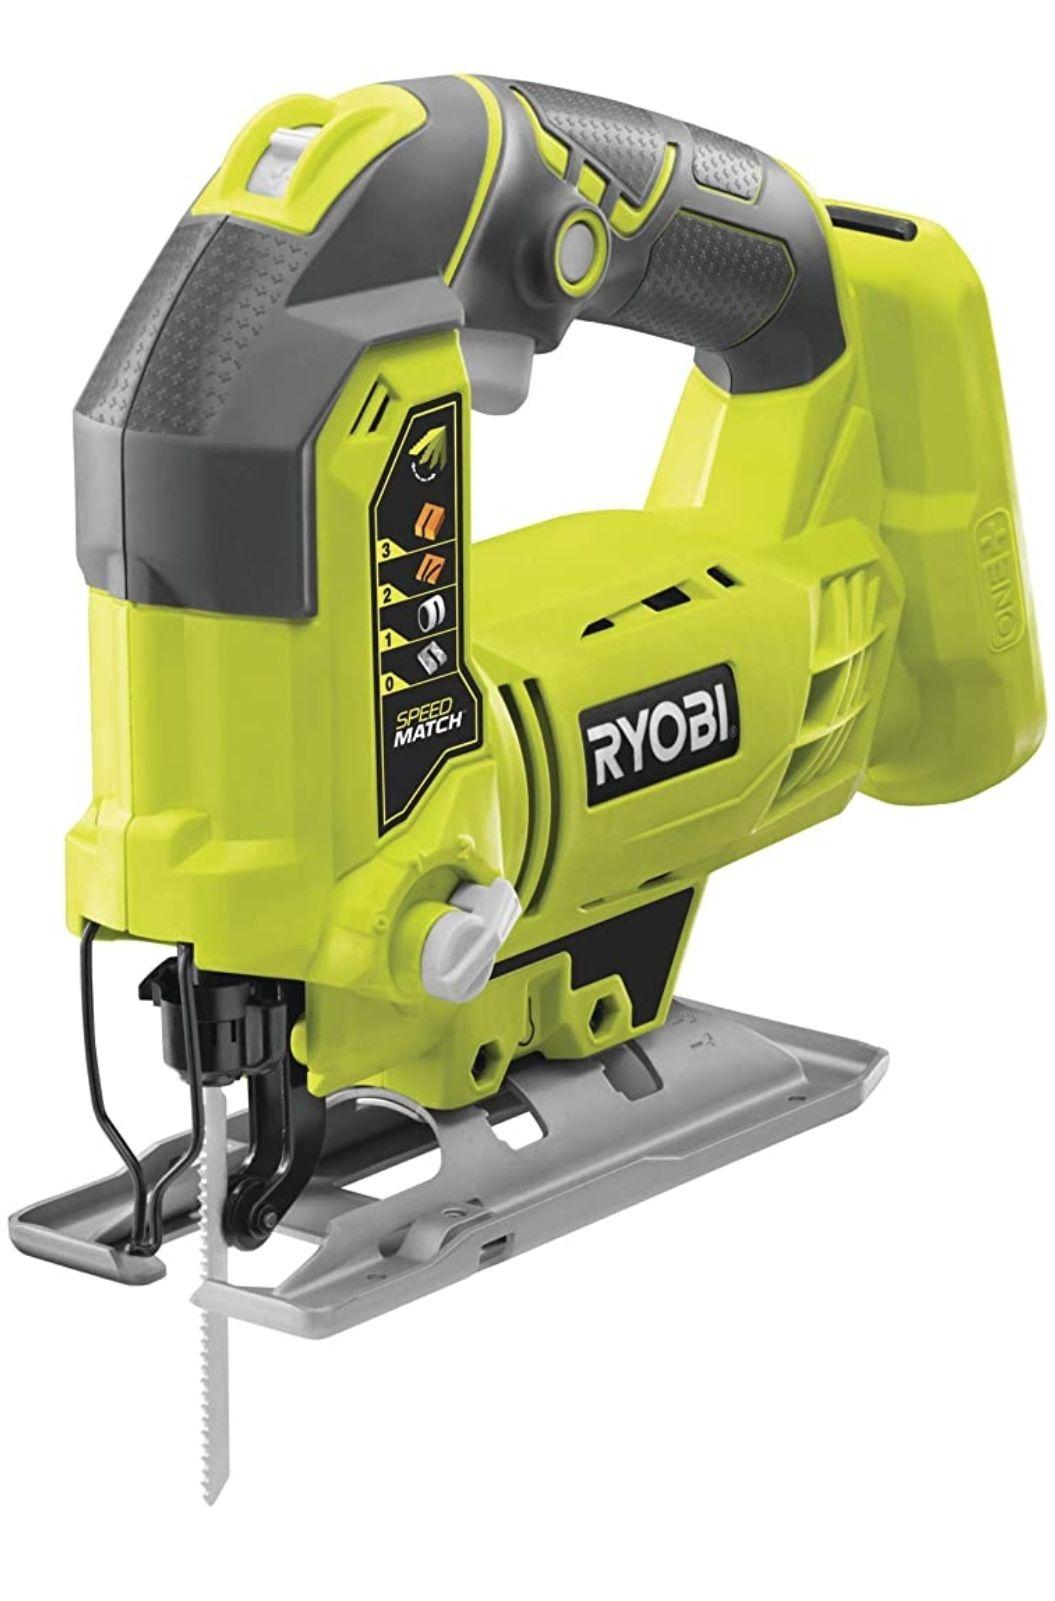 Ryobi R18JS-0 One+ Jigsaw + 3 year warranty - £64 (Free click & collect / £3.95 Delivery) @ Argos